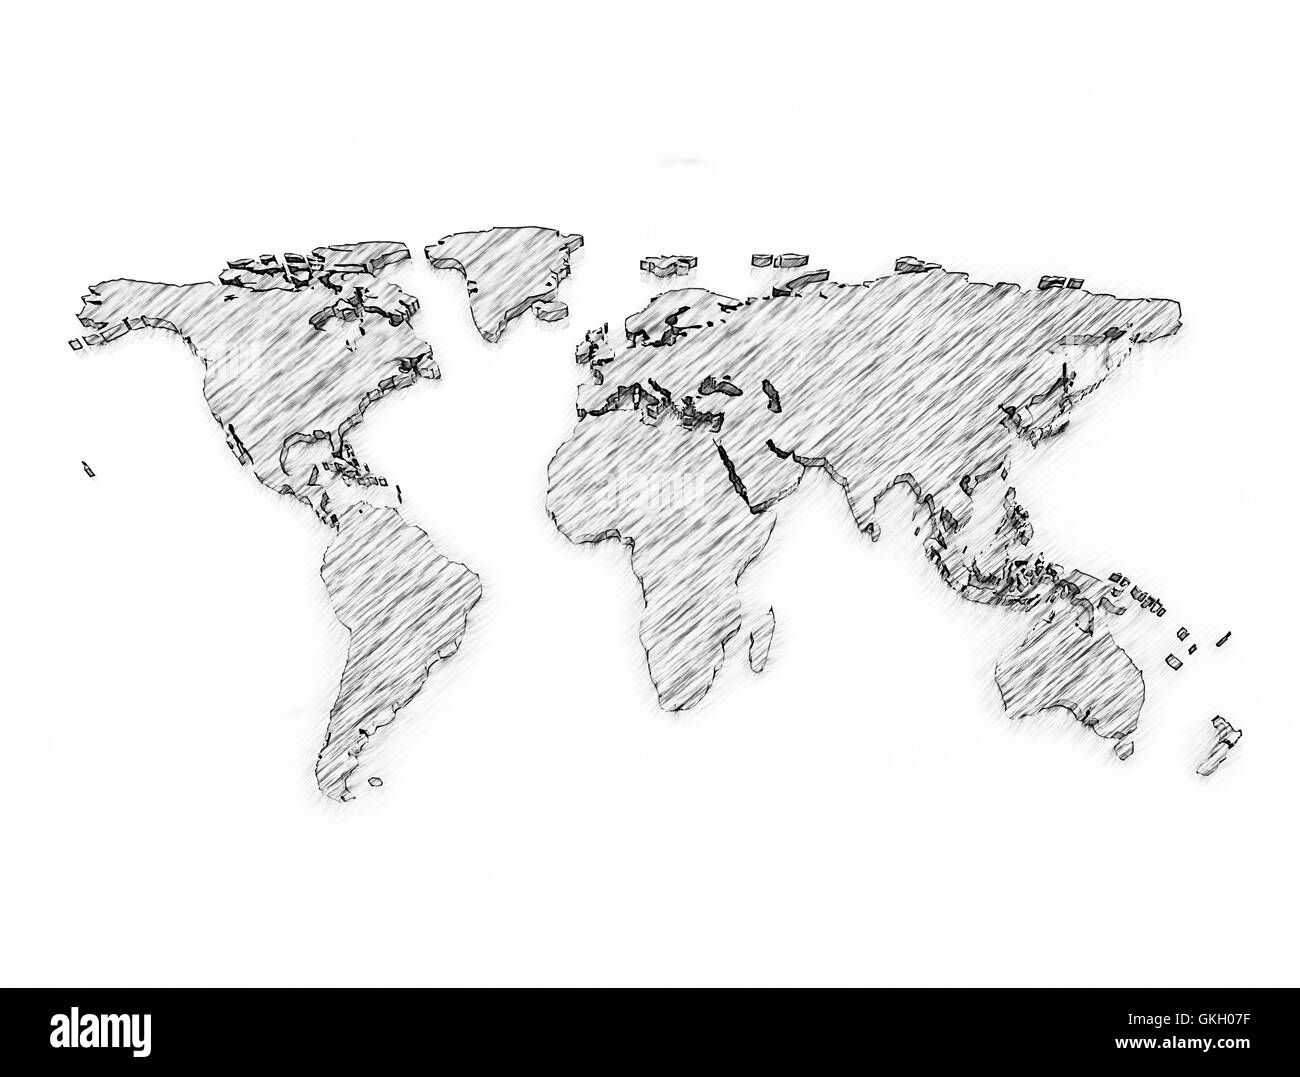 Pencil sketch world map